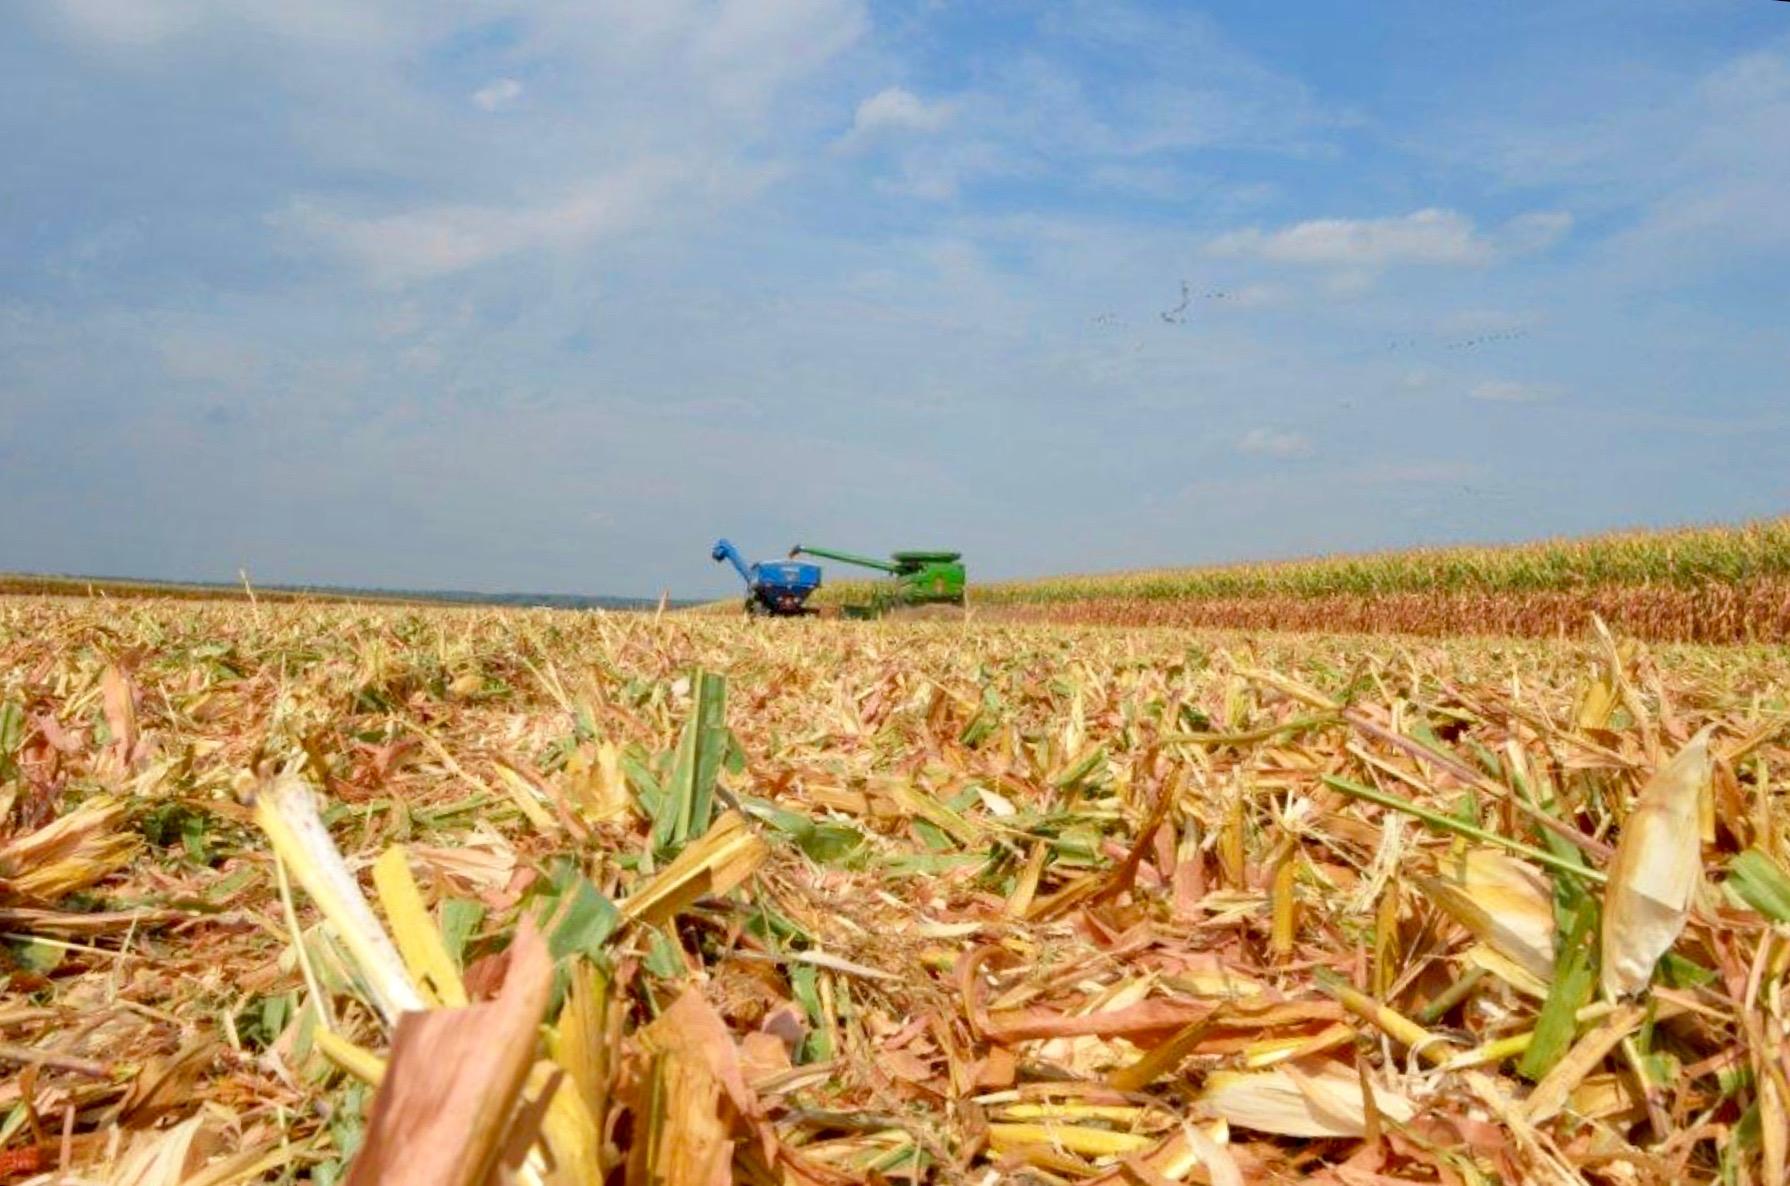 Corn Stalks with Combine